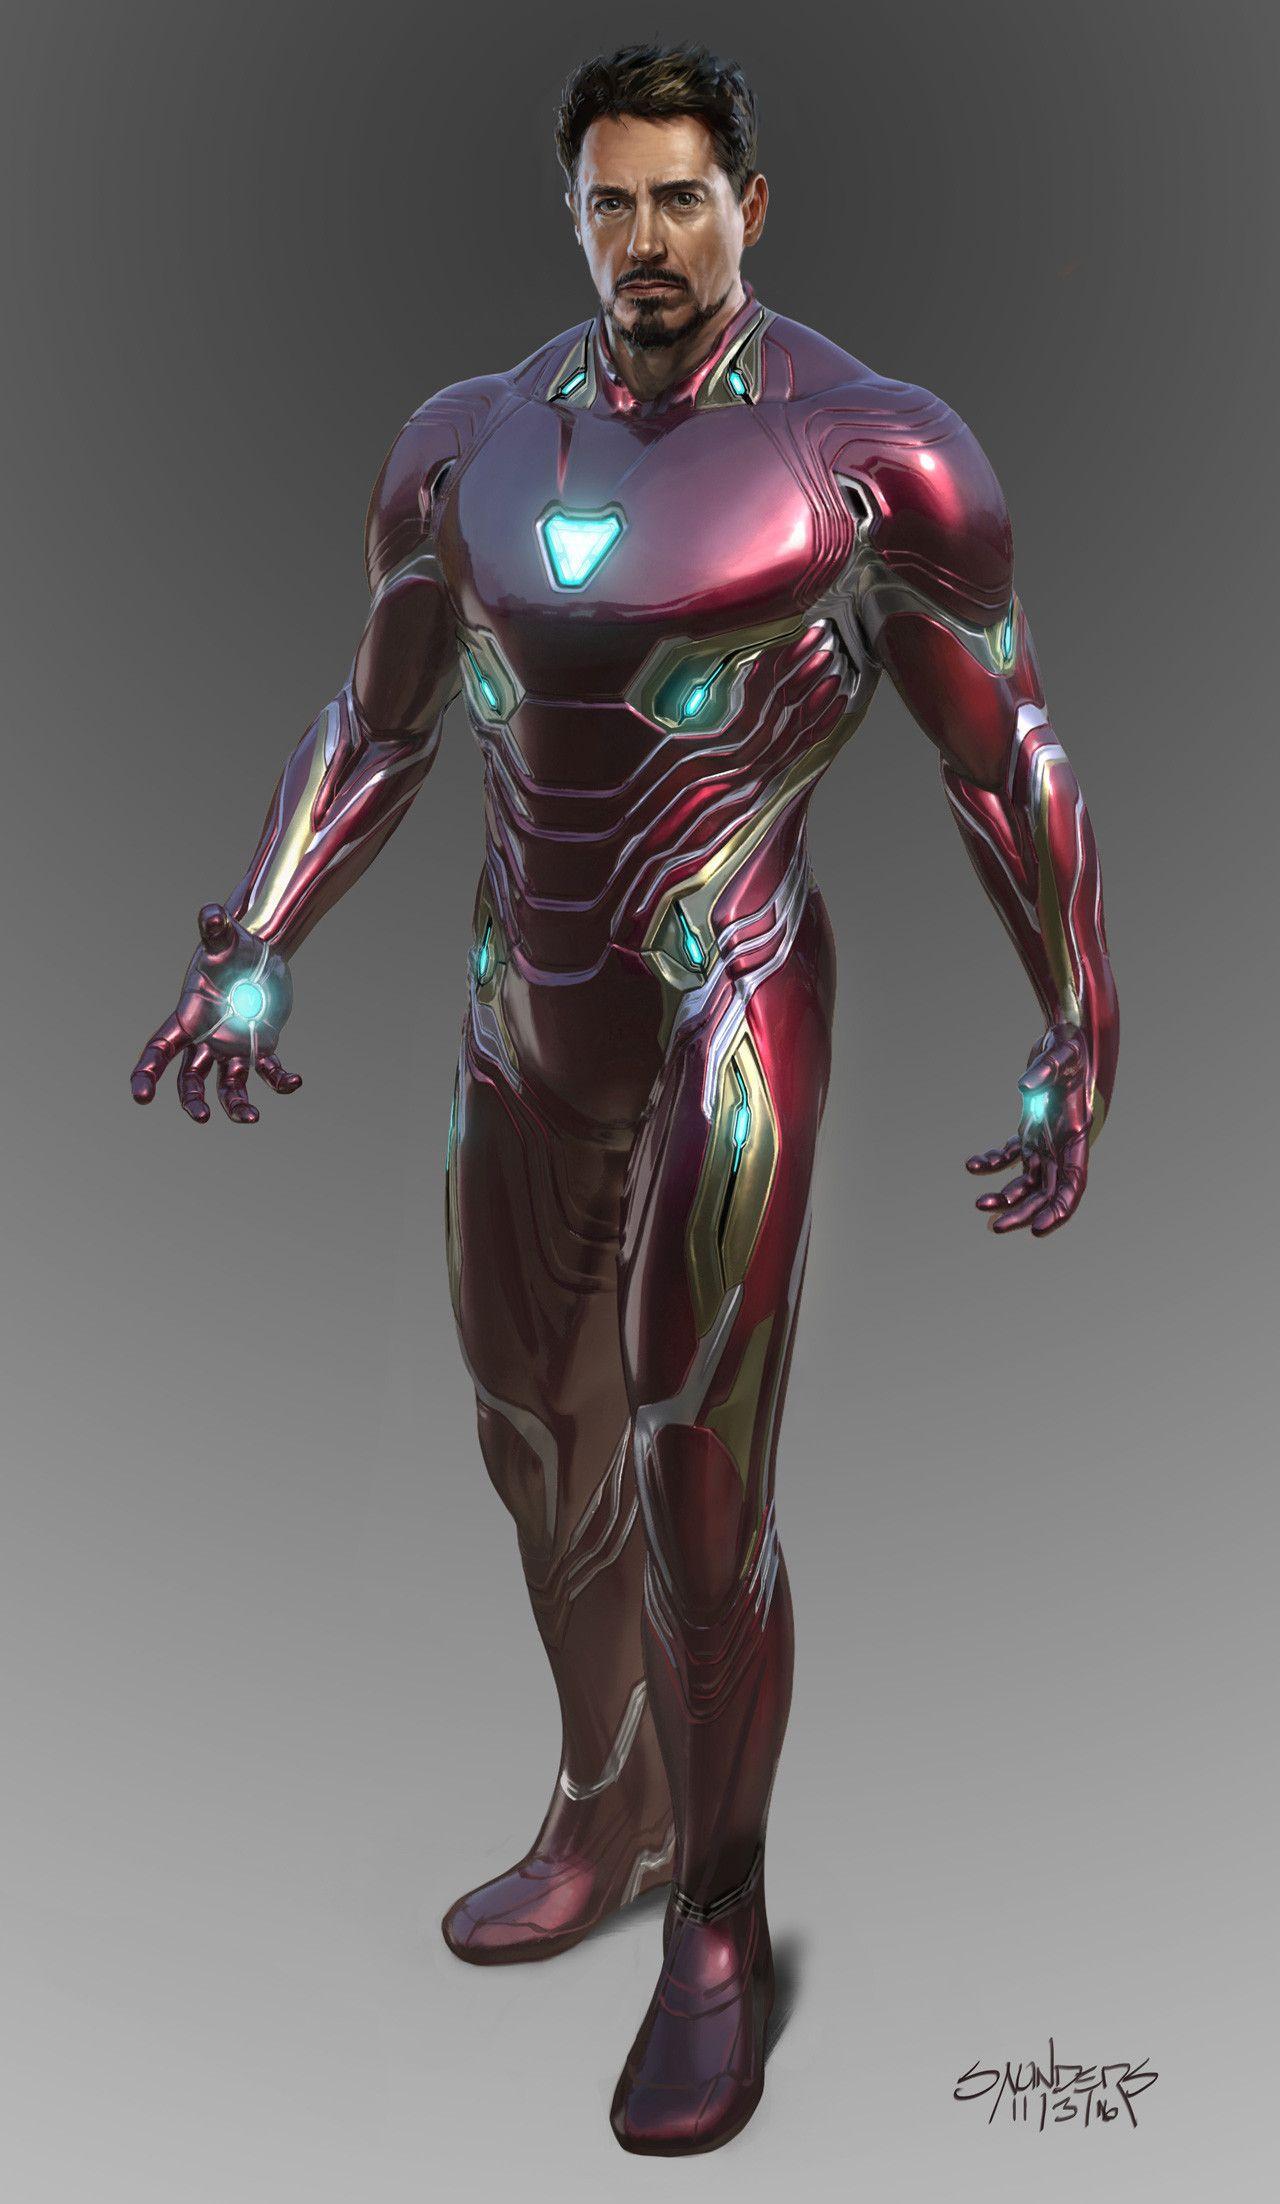 Artstation Avengers Infinity War Iron Man Mk 50 Suit Up Phil Saunders Marvel Iron Man Iron Man Avengers Iron Man Armor